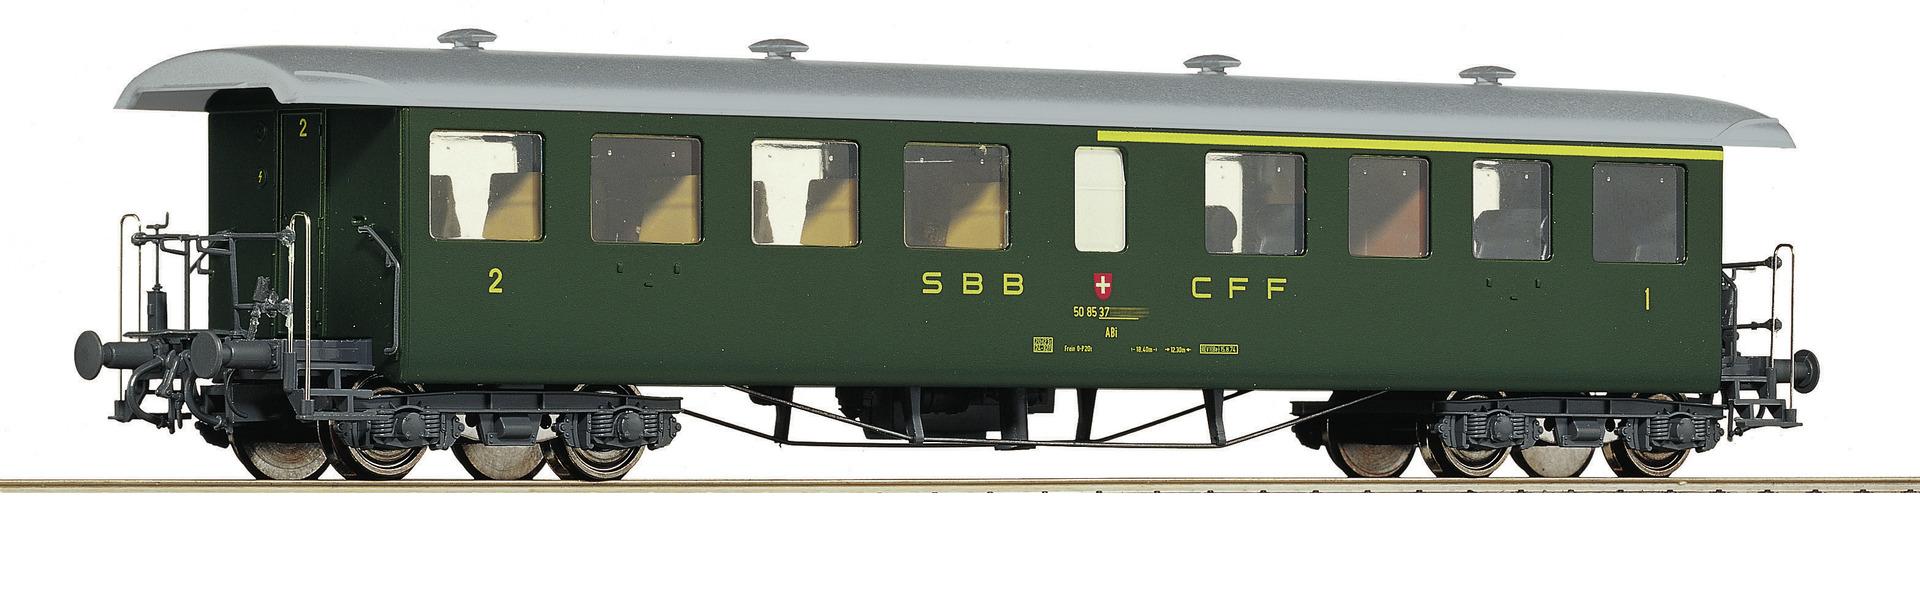 Roco44730 SBB class1/2